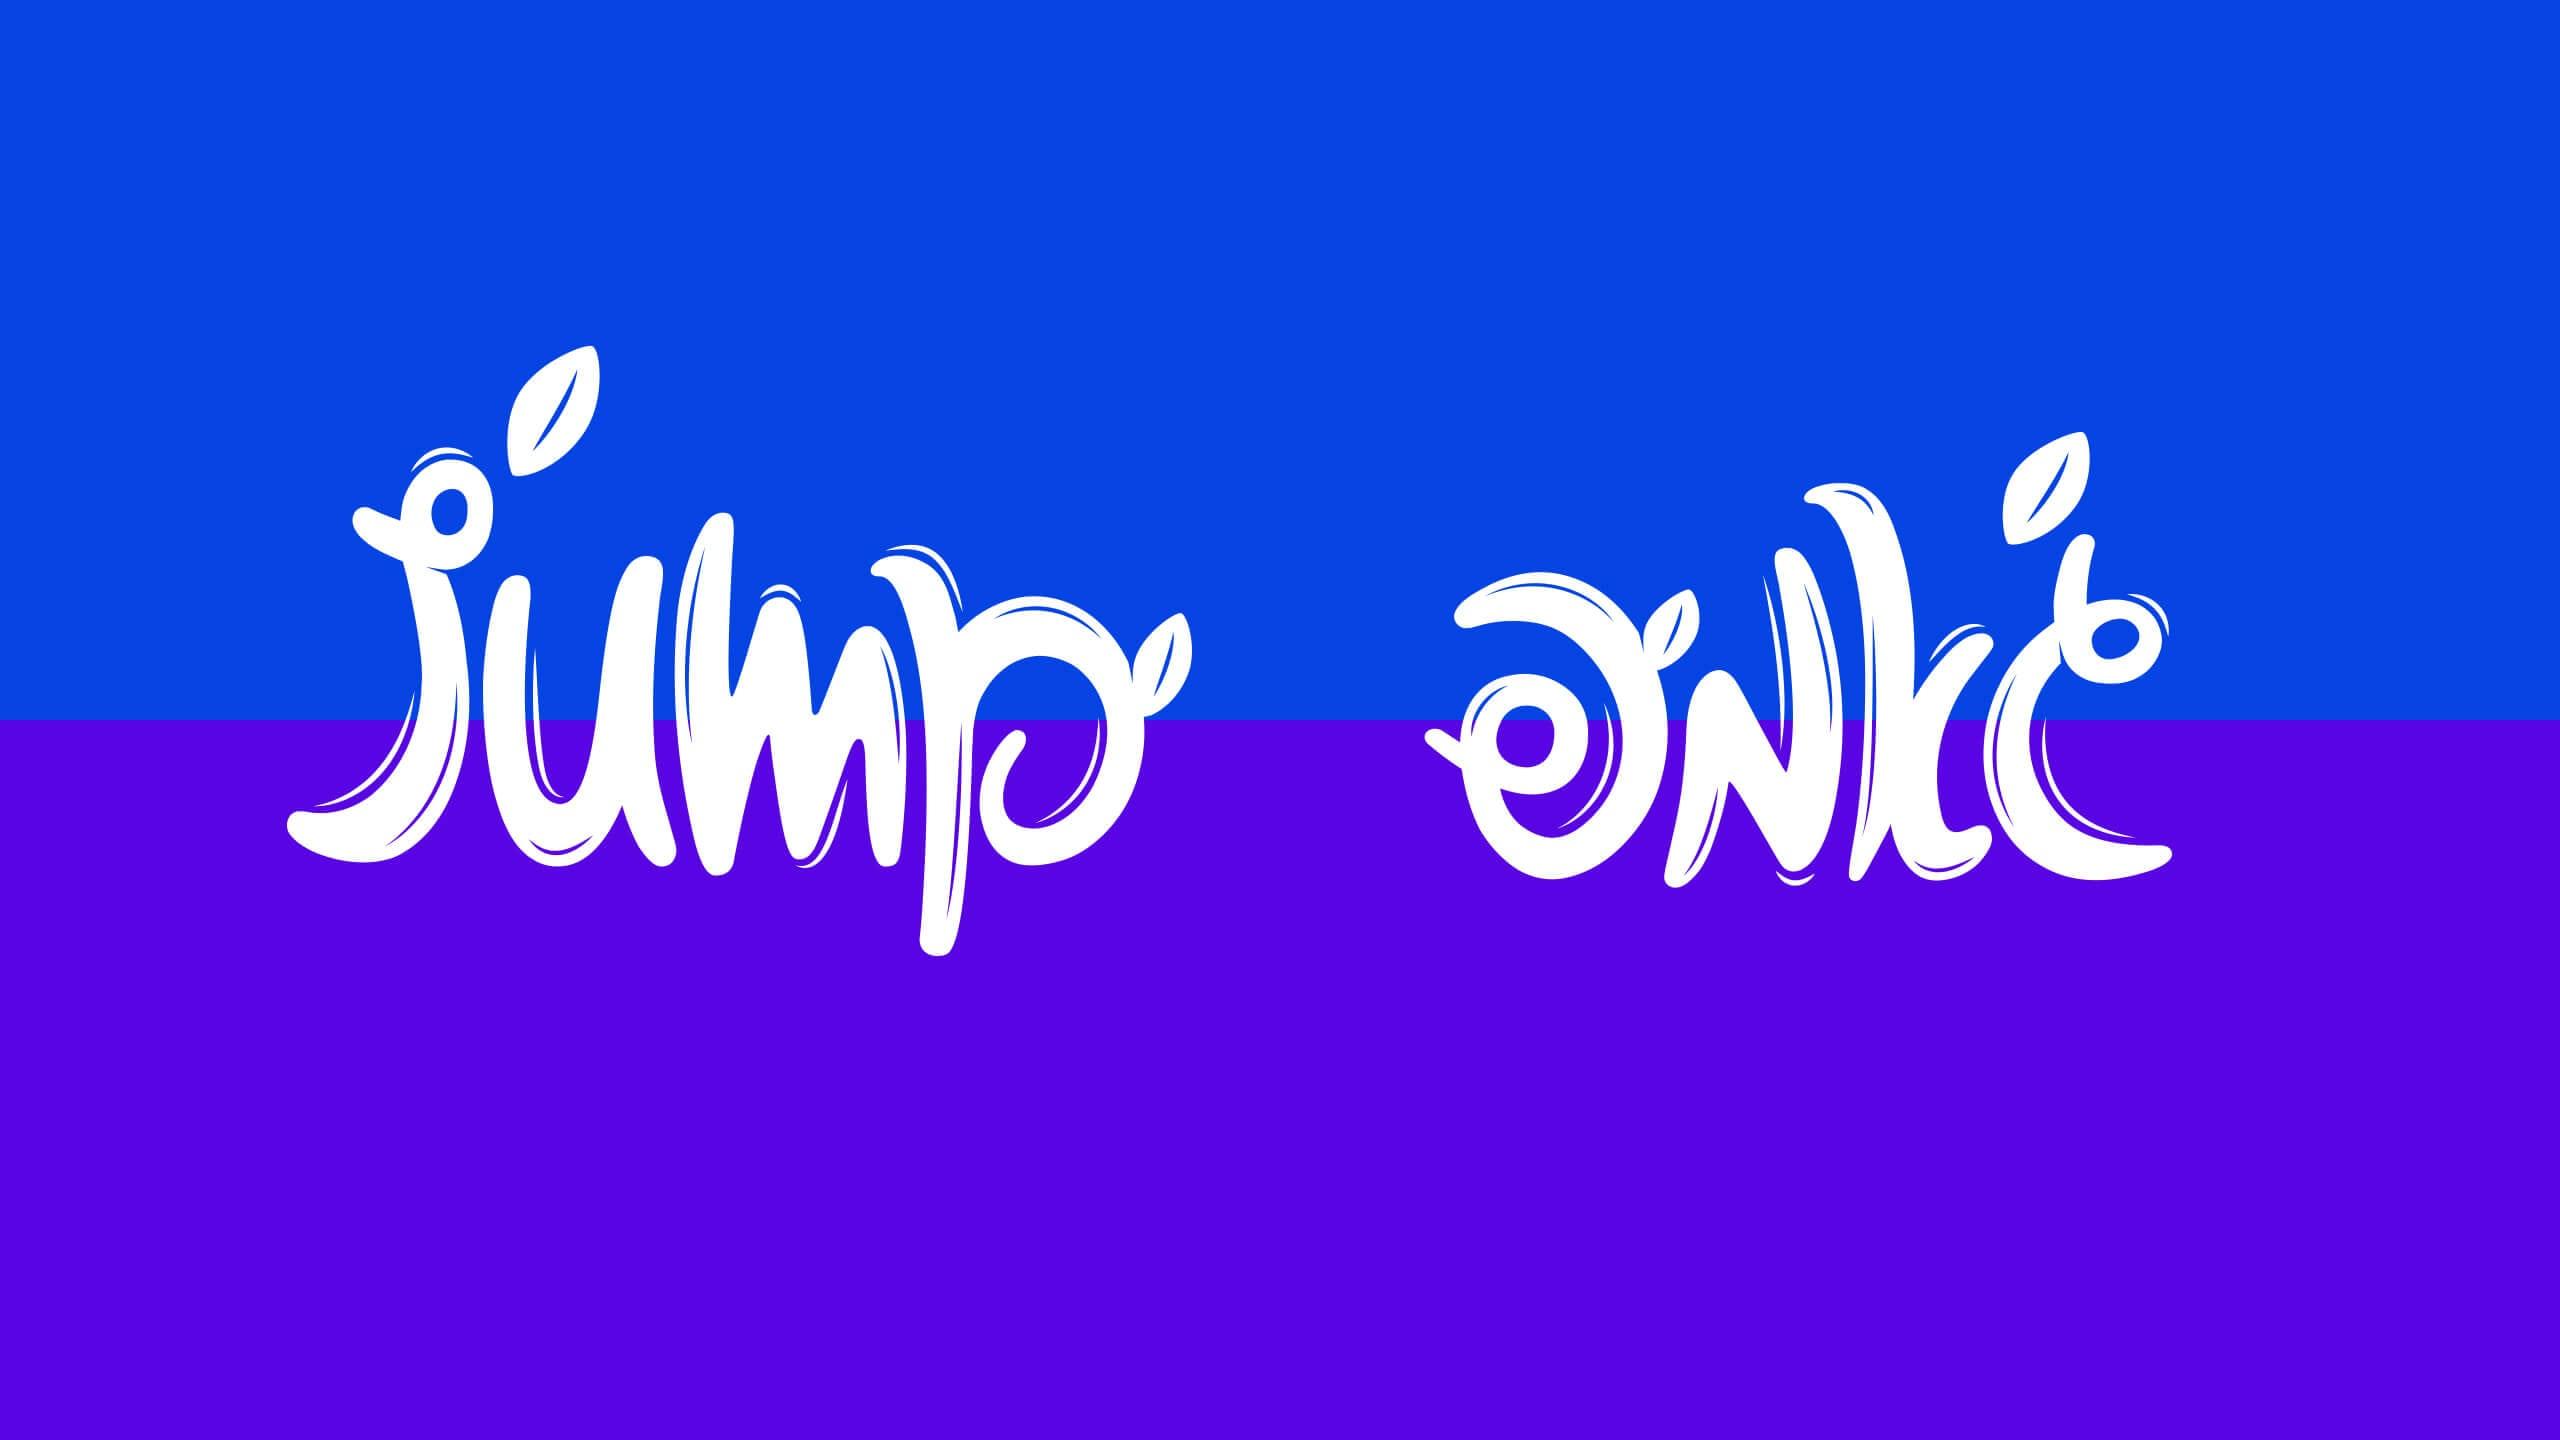 jump_main_2560-1440_7